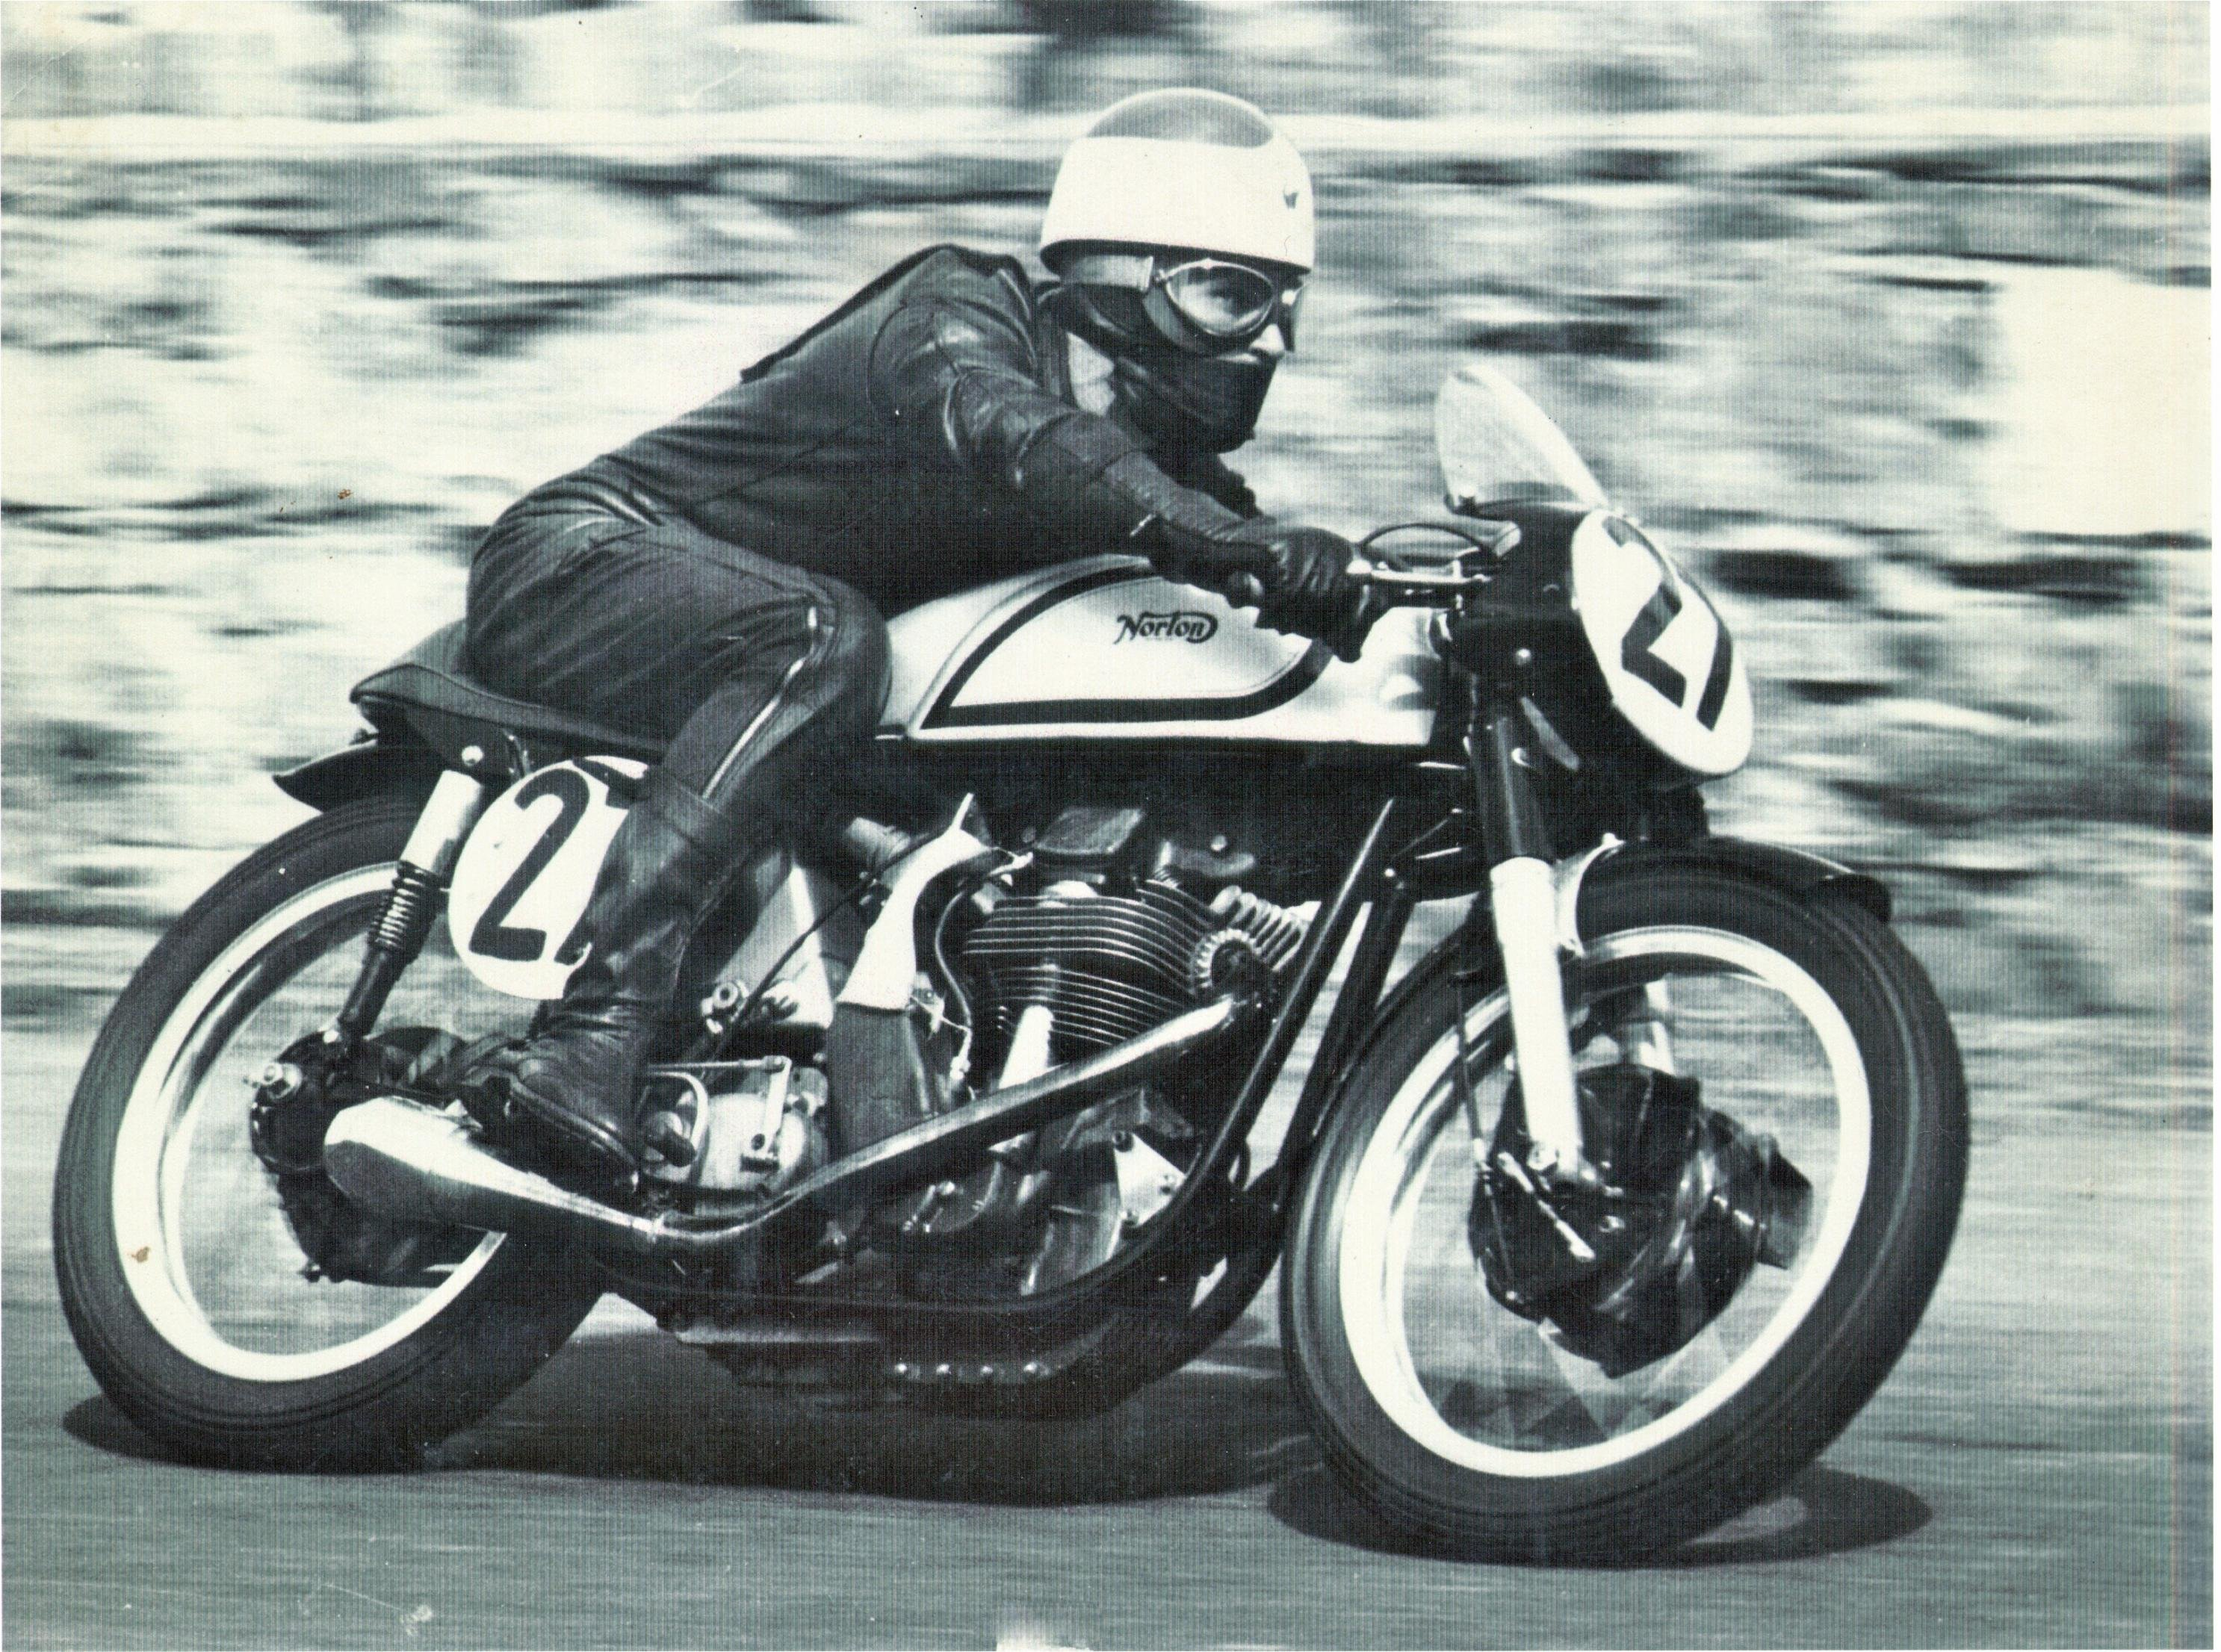 Remarkable, very vintage race motorcycle me, please